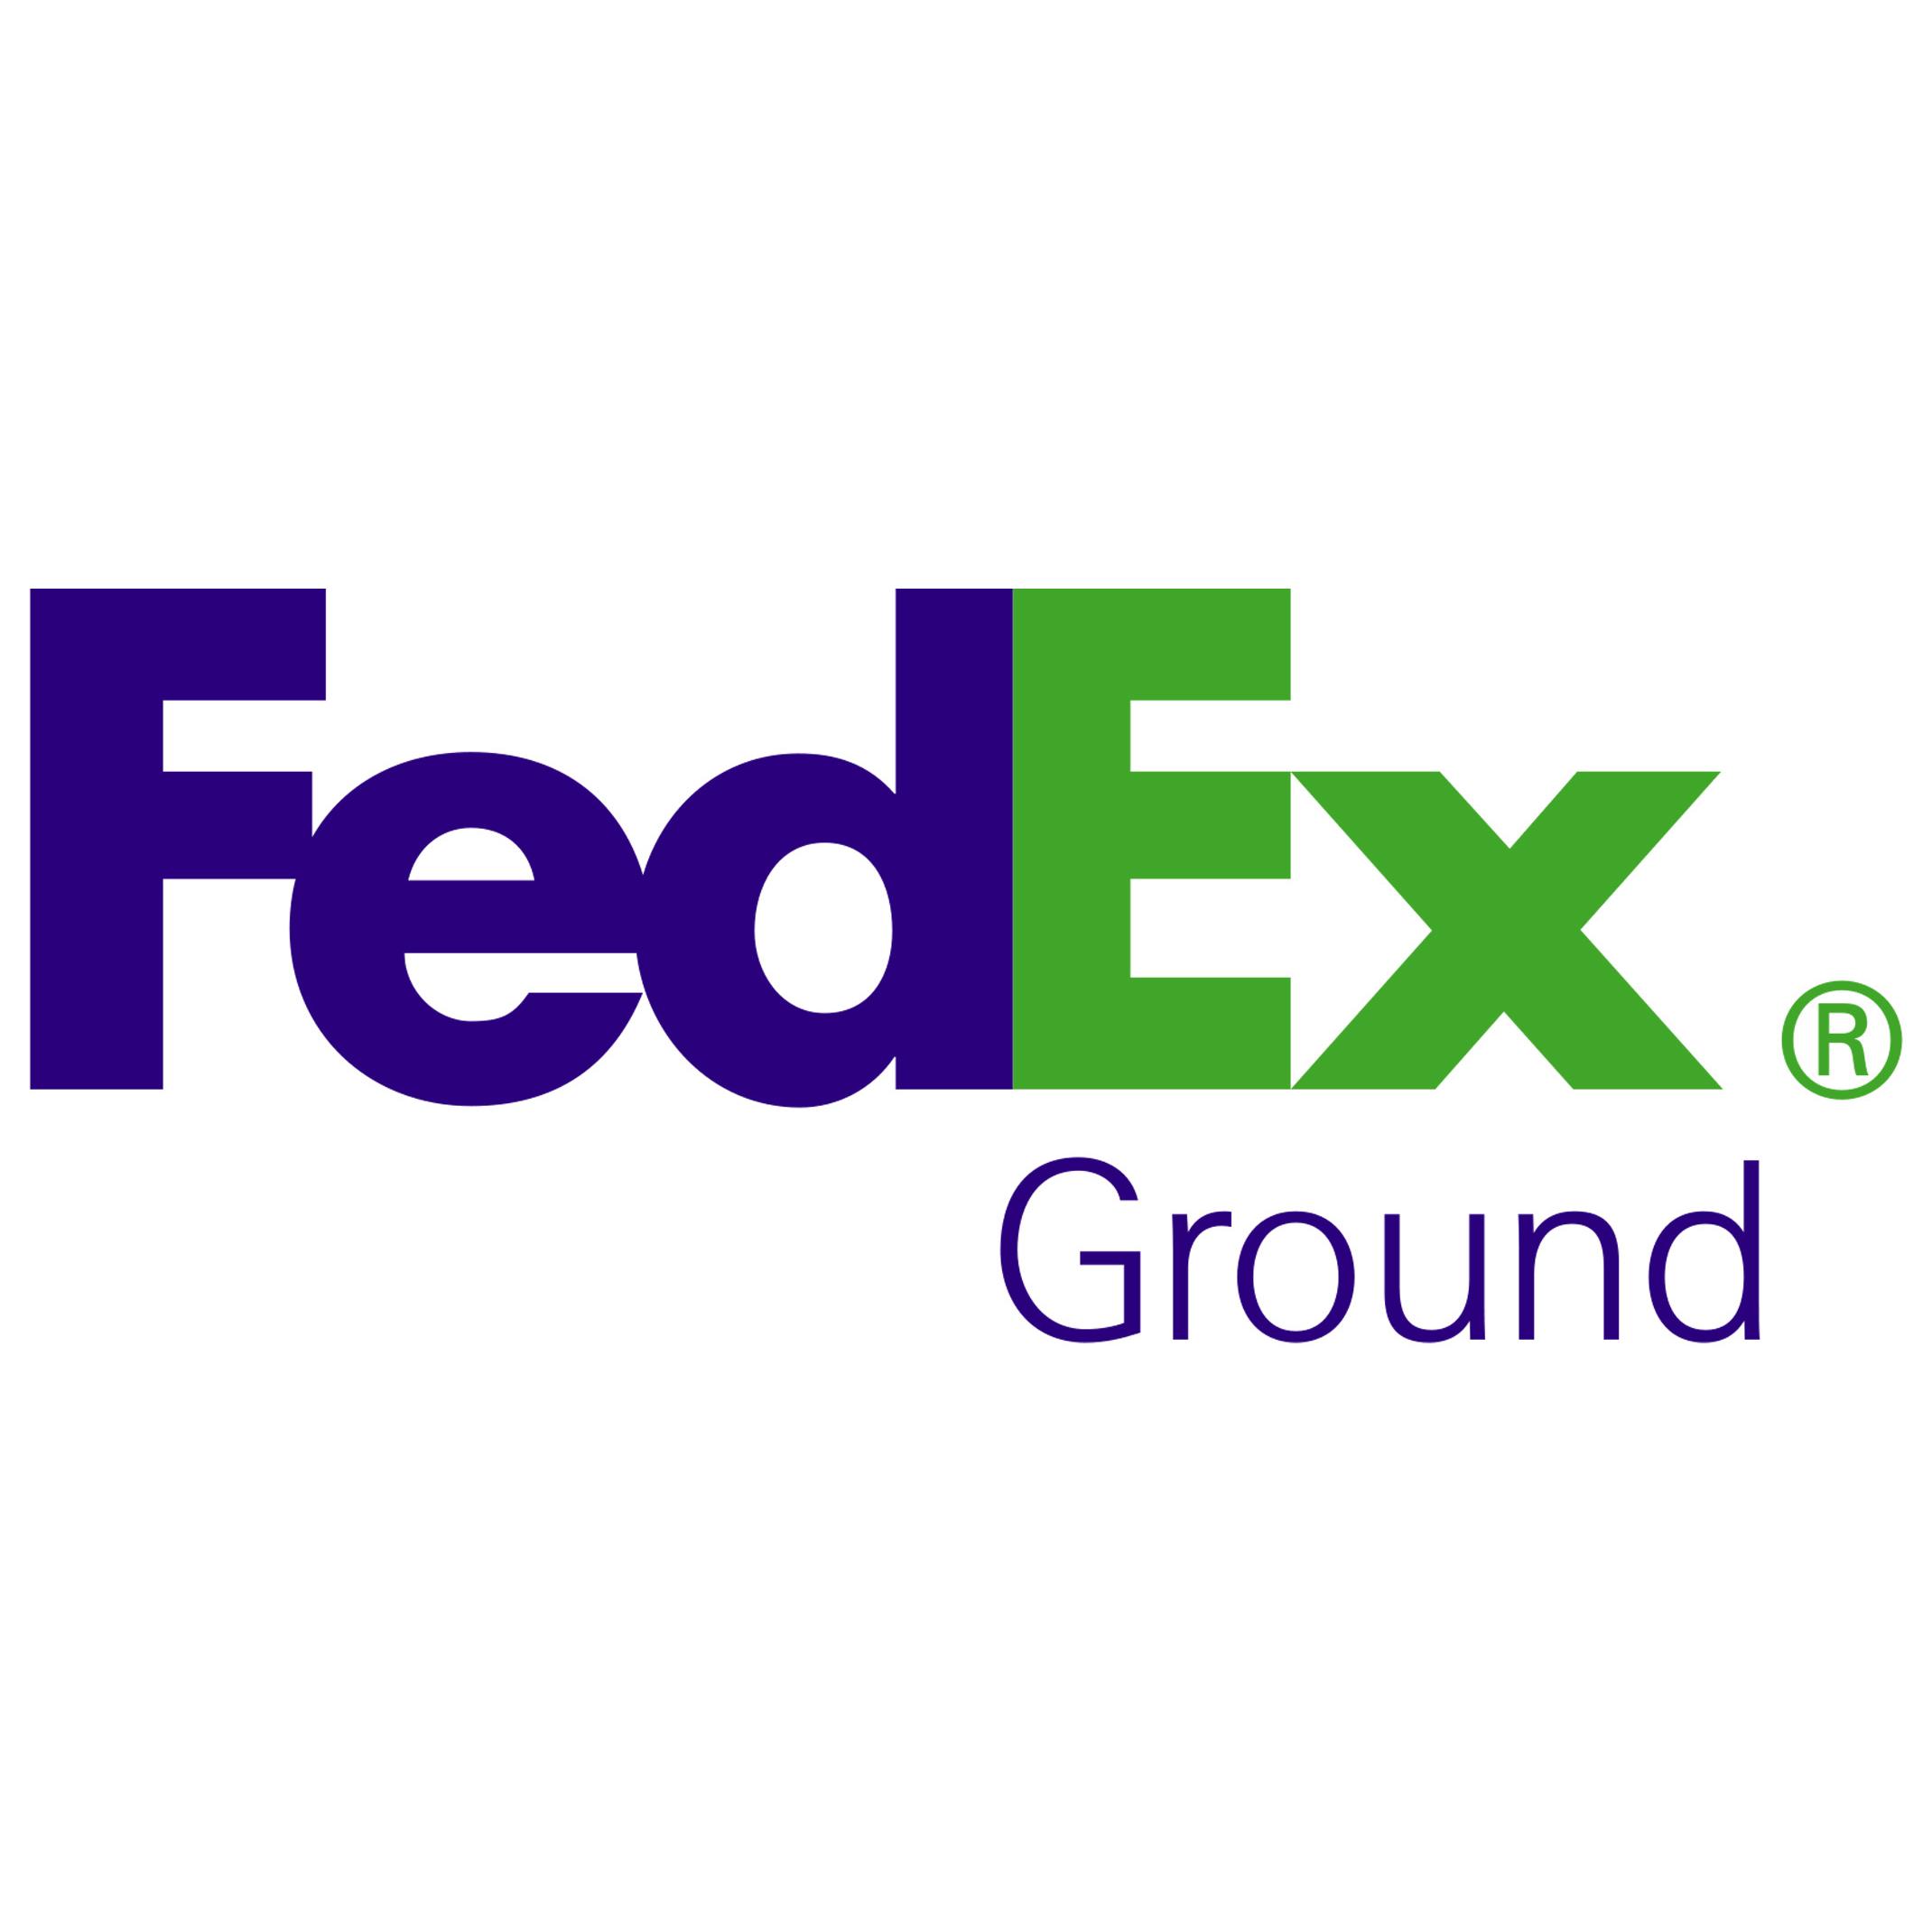 Image result for fedex ground logo